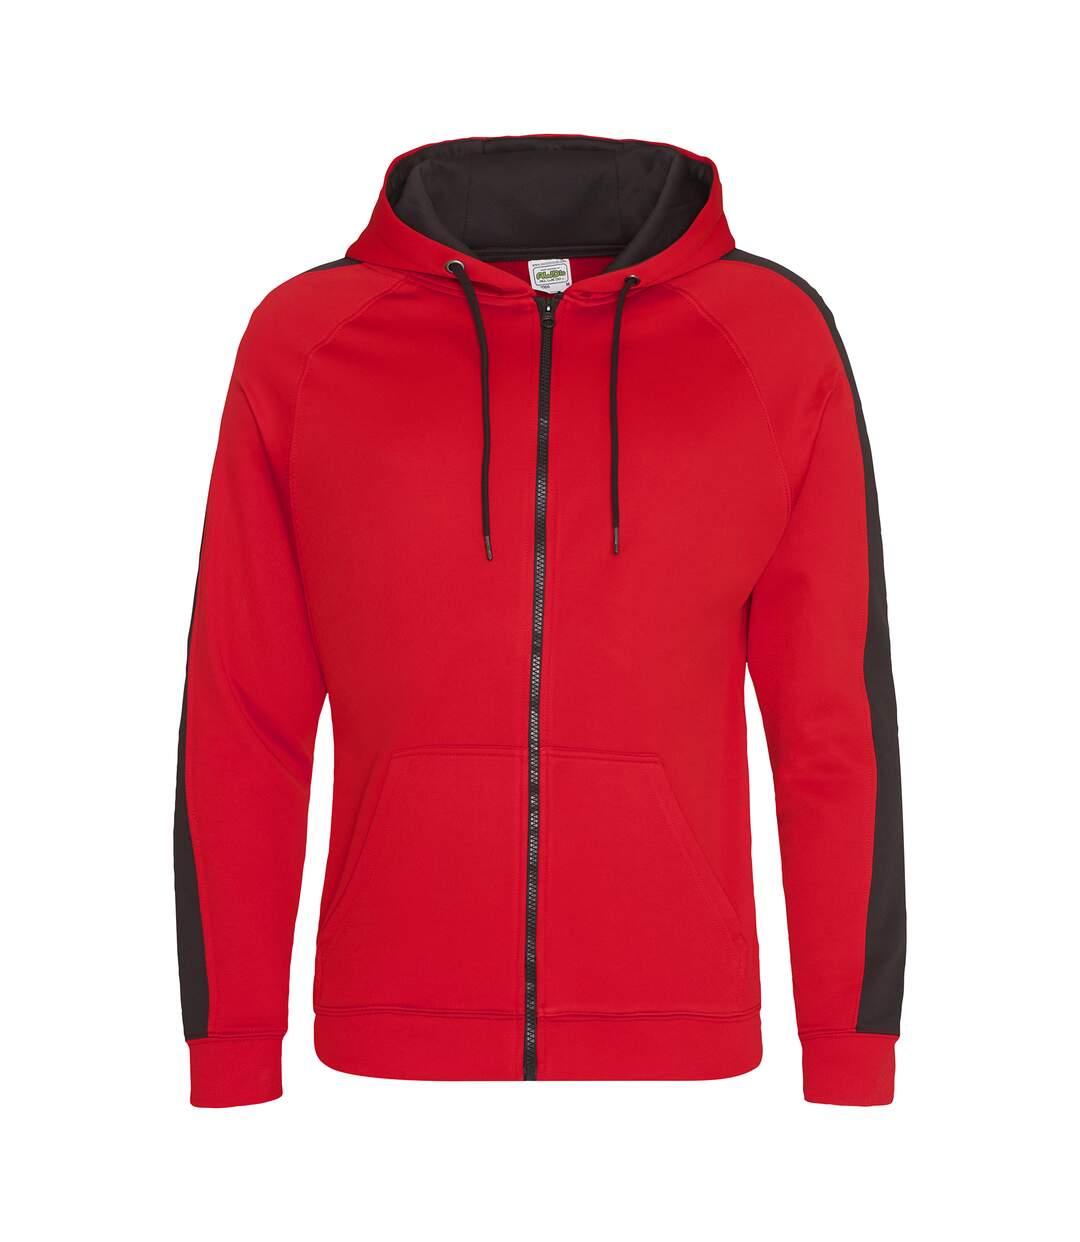 AWDis Just Hoods Mens Contrast Sports Polyester Full Zip Hoodie (Fire Red/Jet Black) - UTPC2967